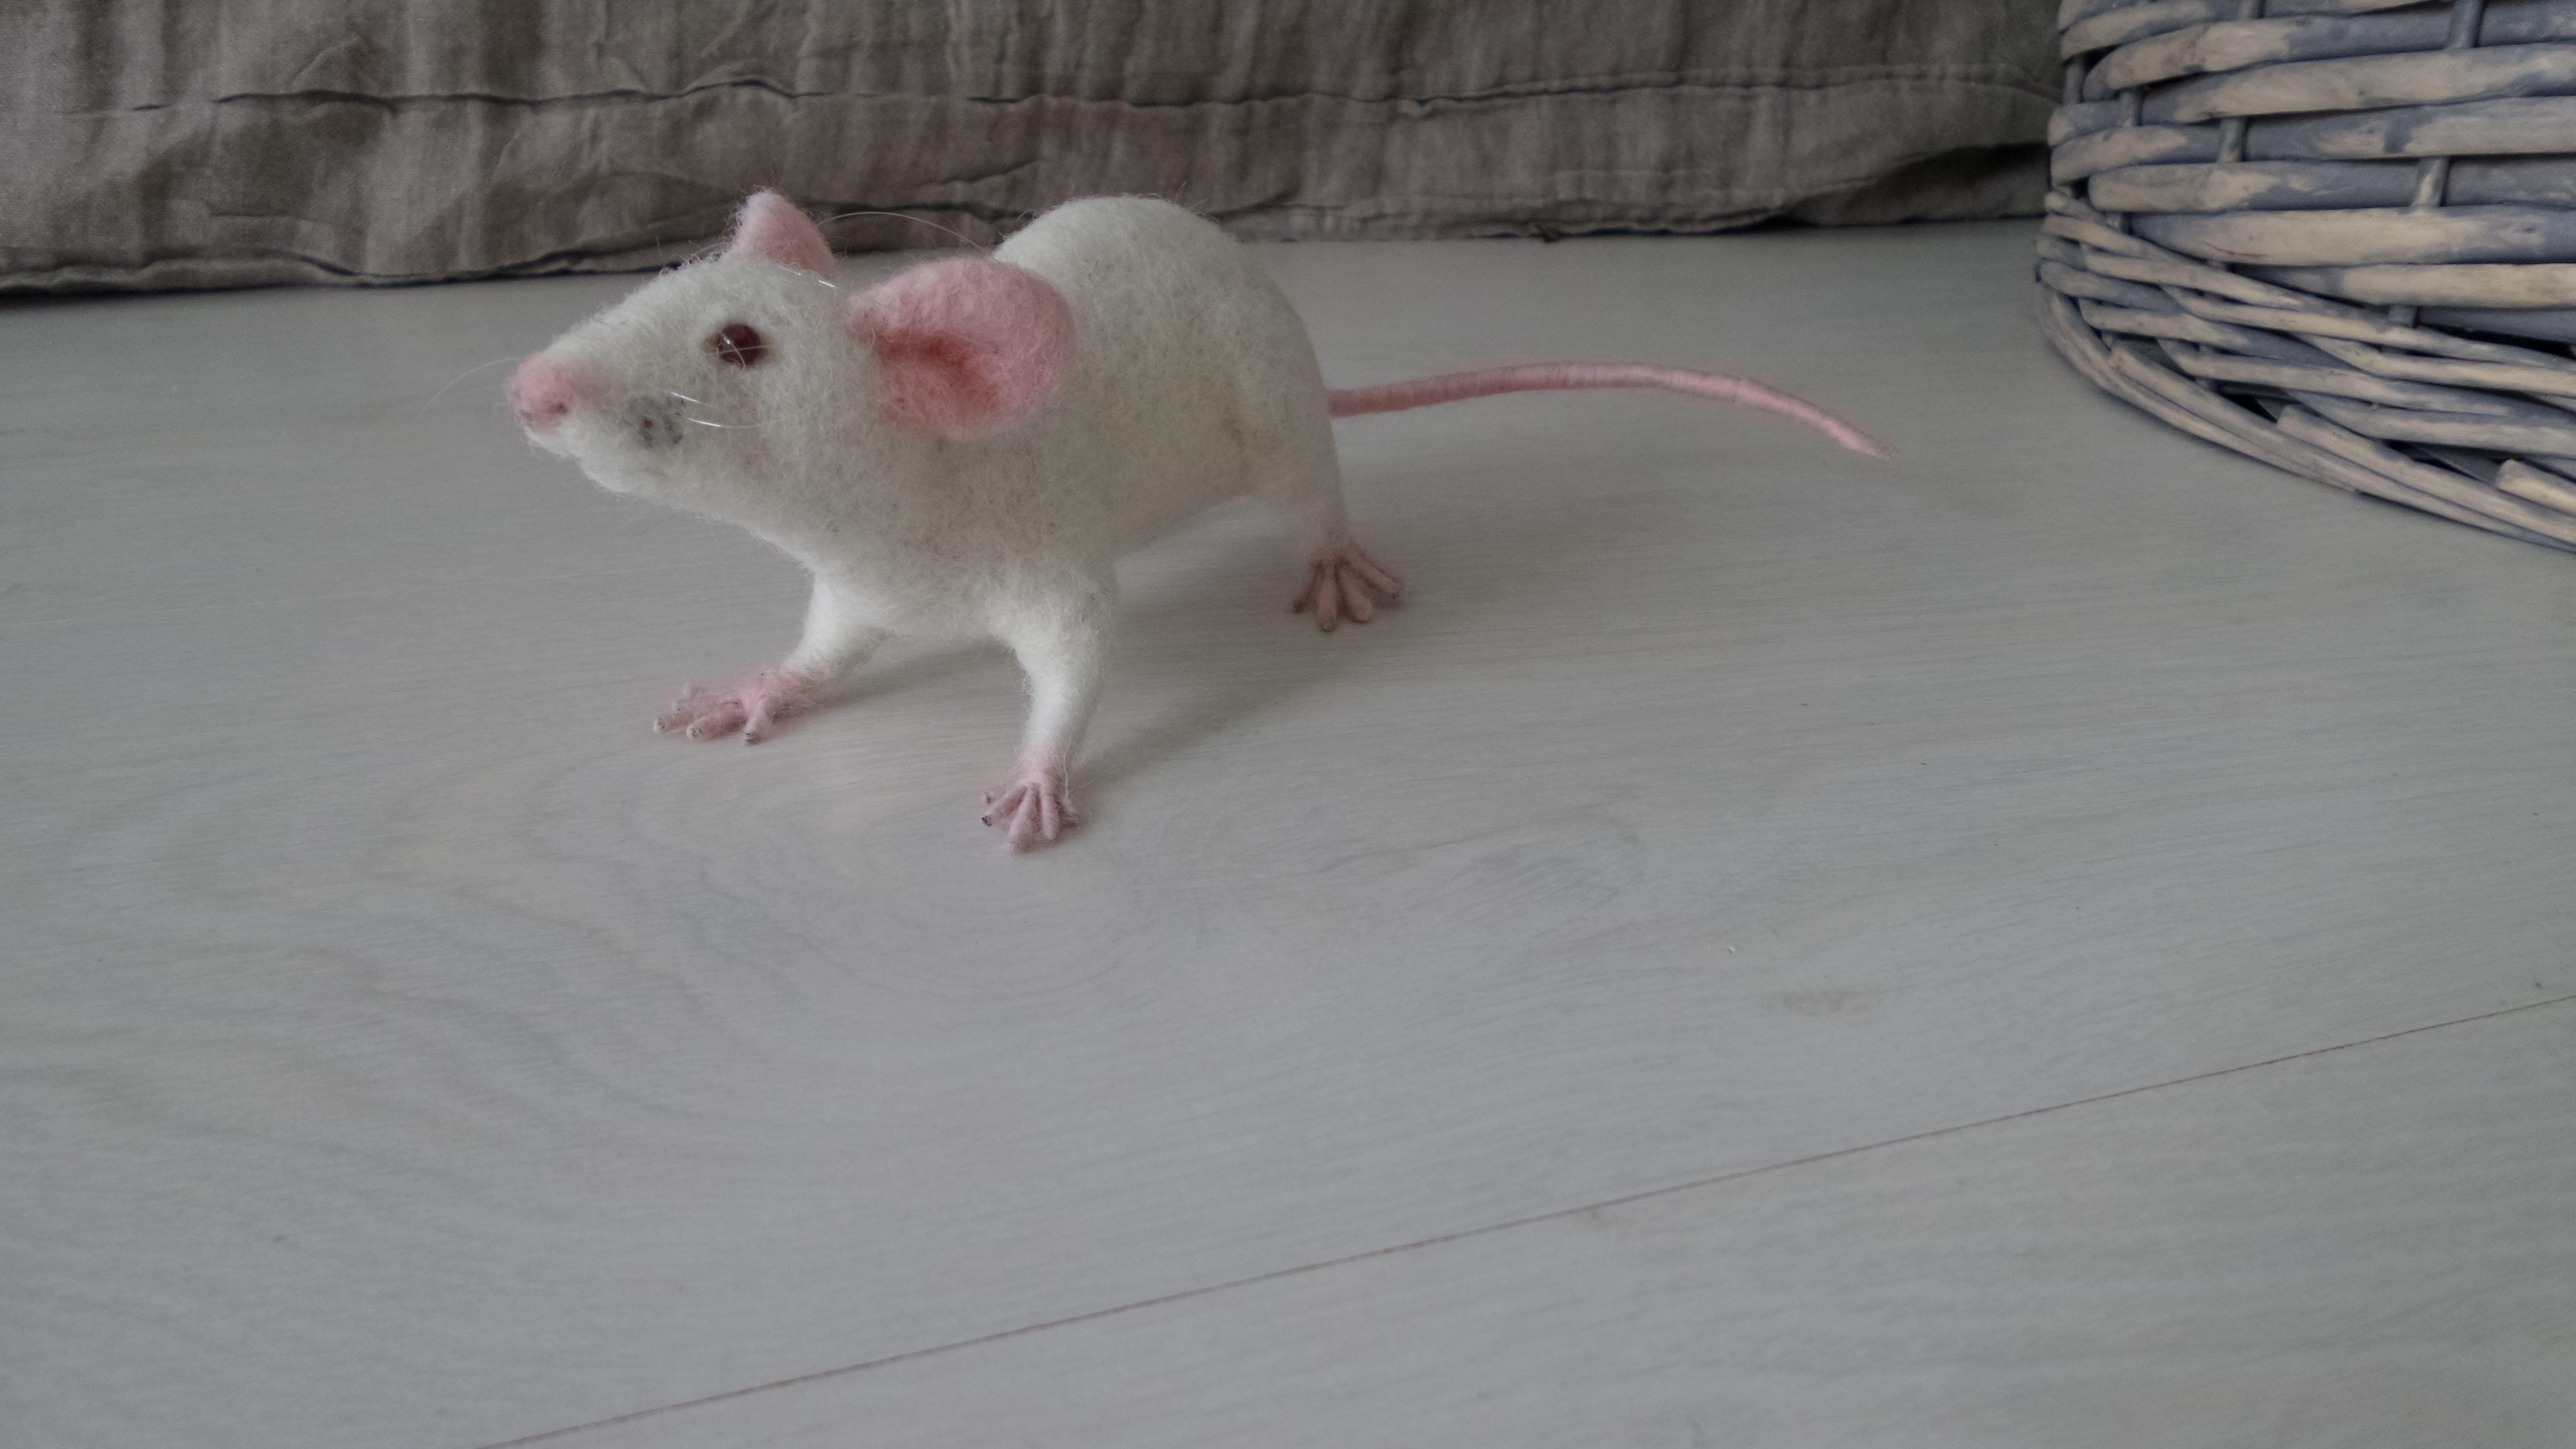 laboratoryrat domesticrats whiterat feltedmouse sciencegift albinoanimals ratlossgifts ratportrait stuffedrat ratlover